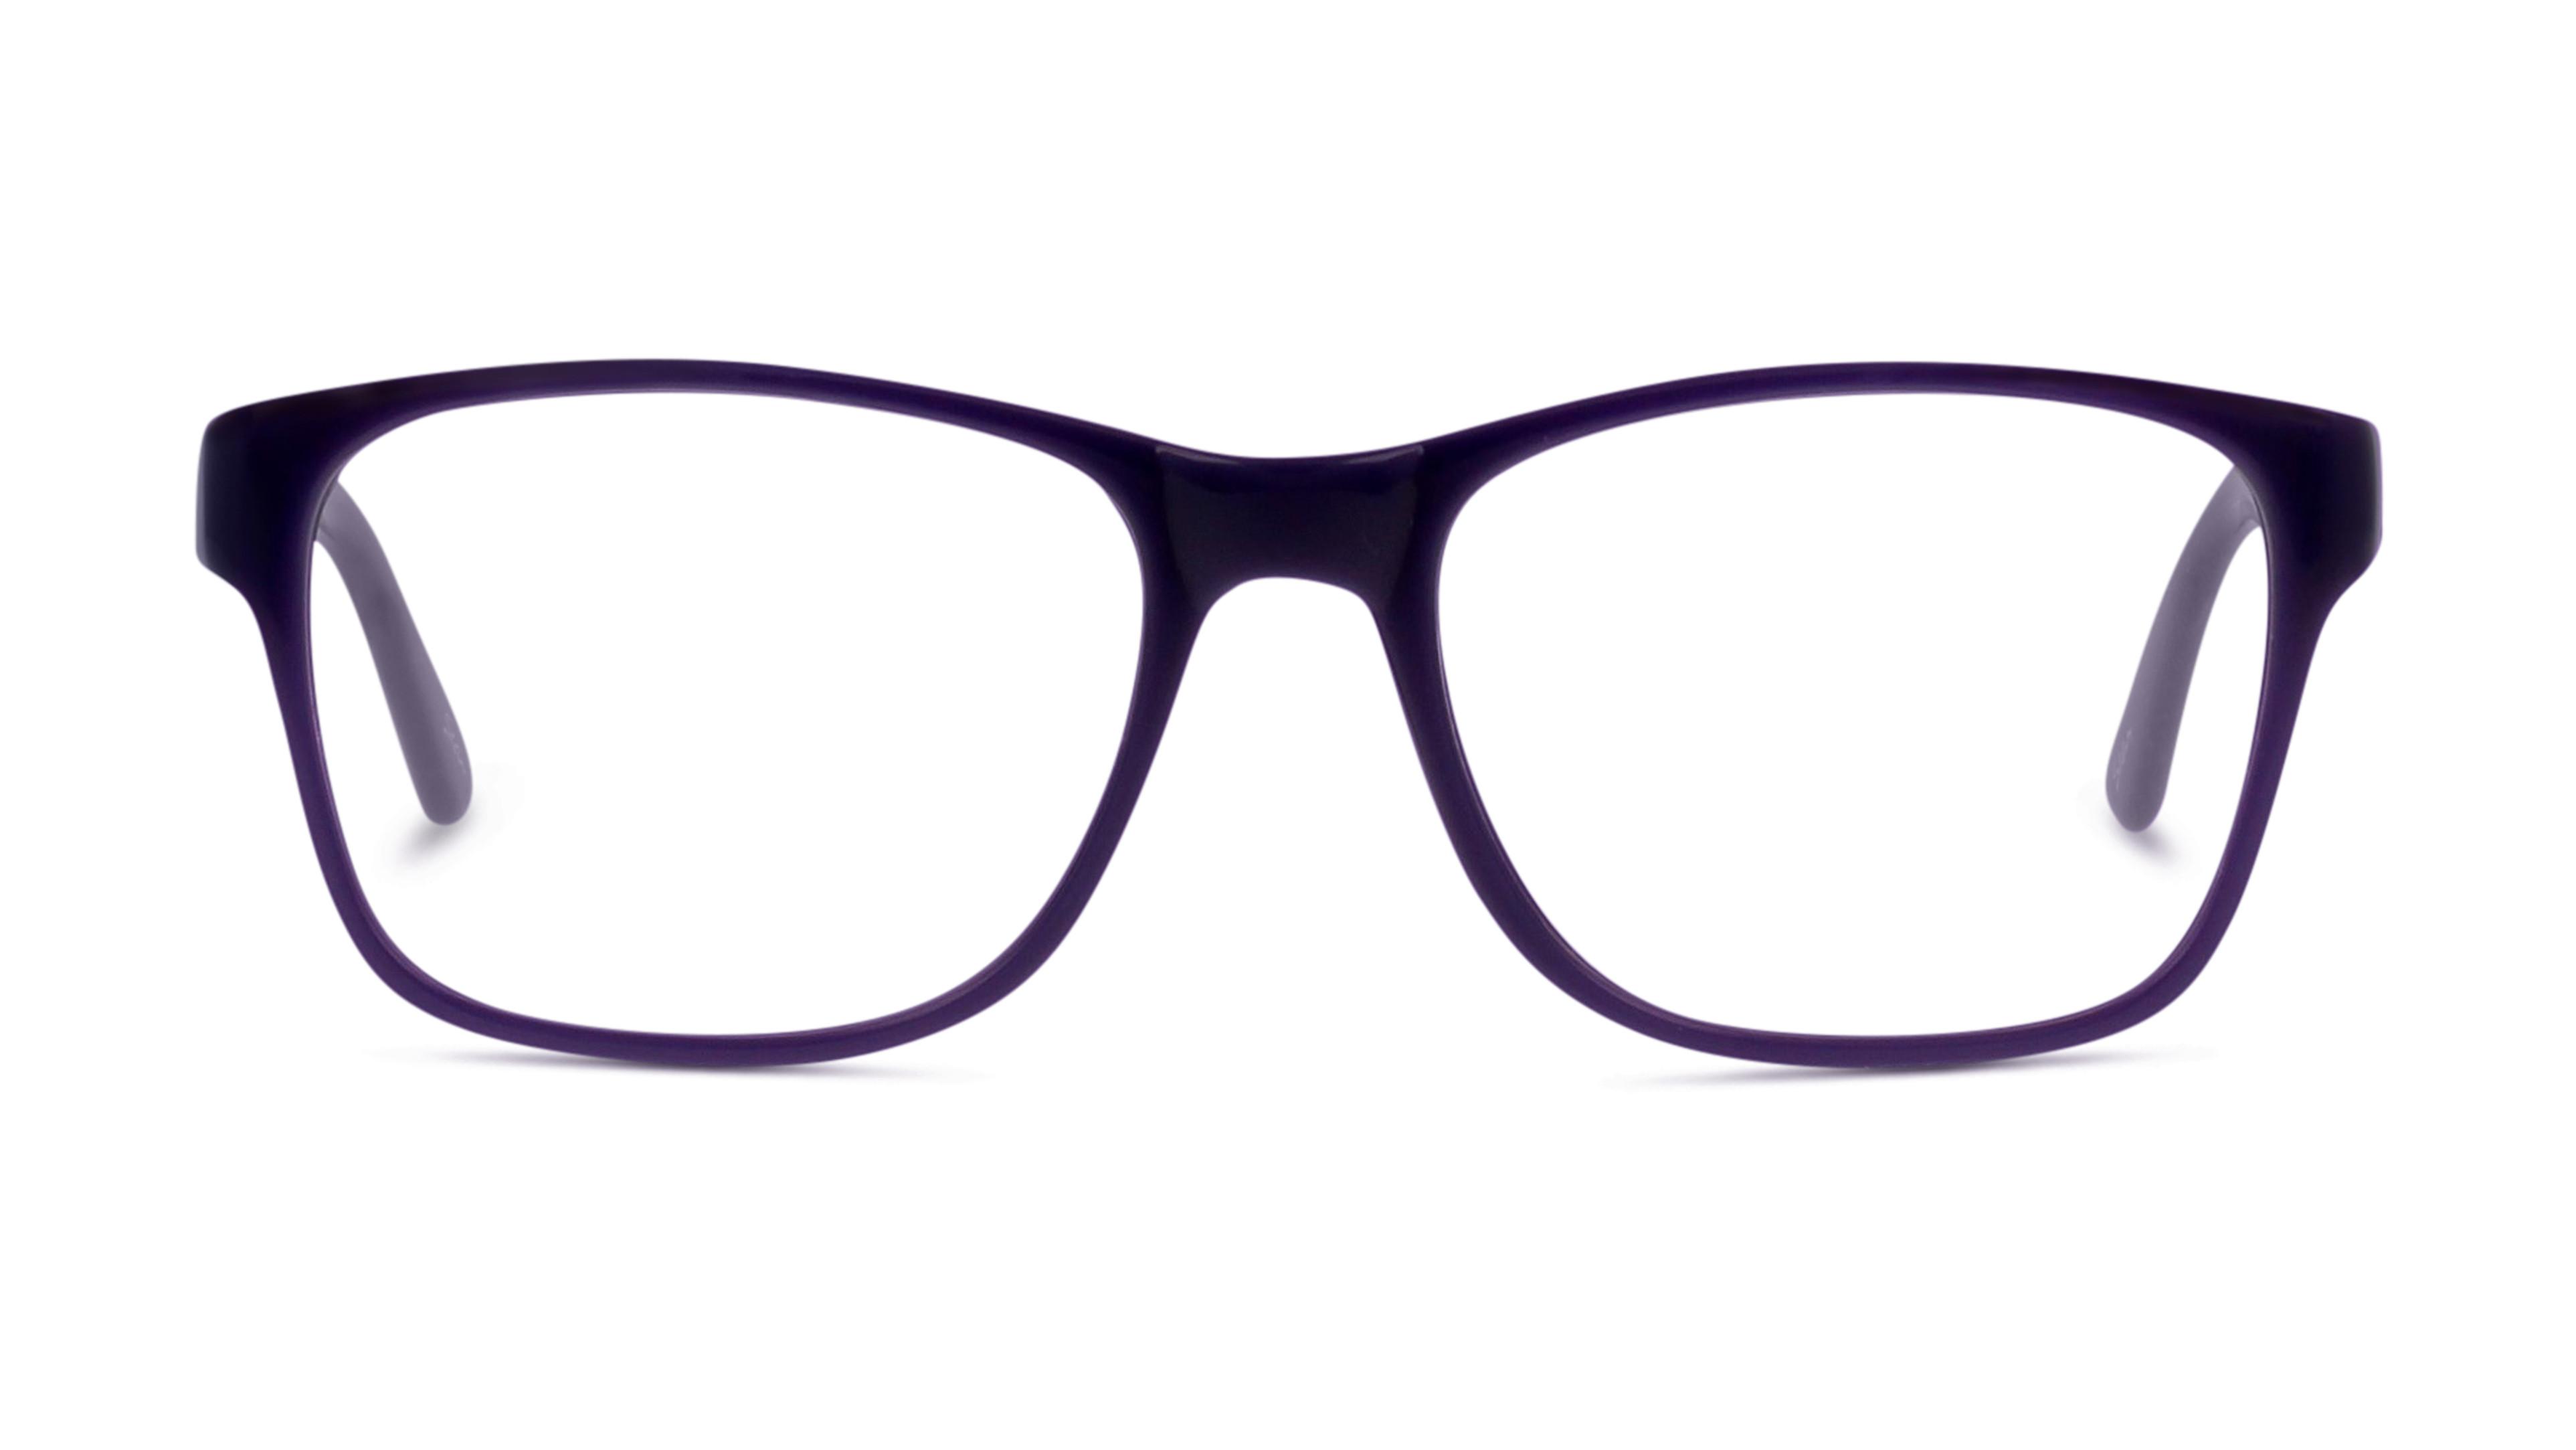 8719154595899-front-01-seen-sncf29-eyewear-violet